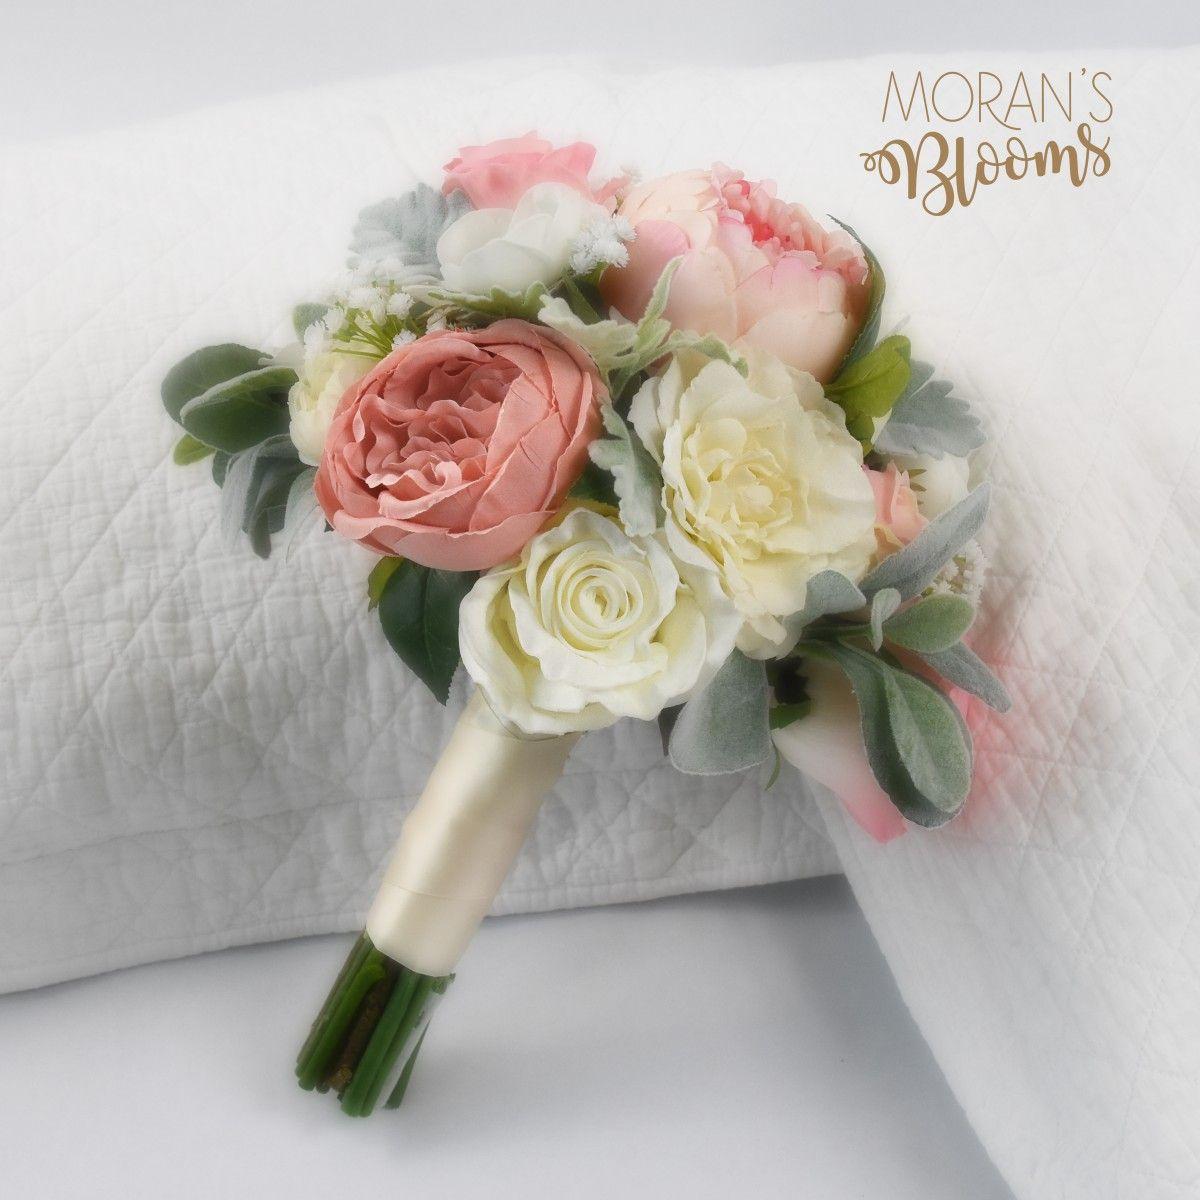 Morans Blooms Silk Floral Design Moransblooms Bridal Bouquet